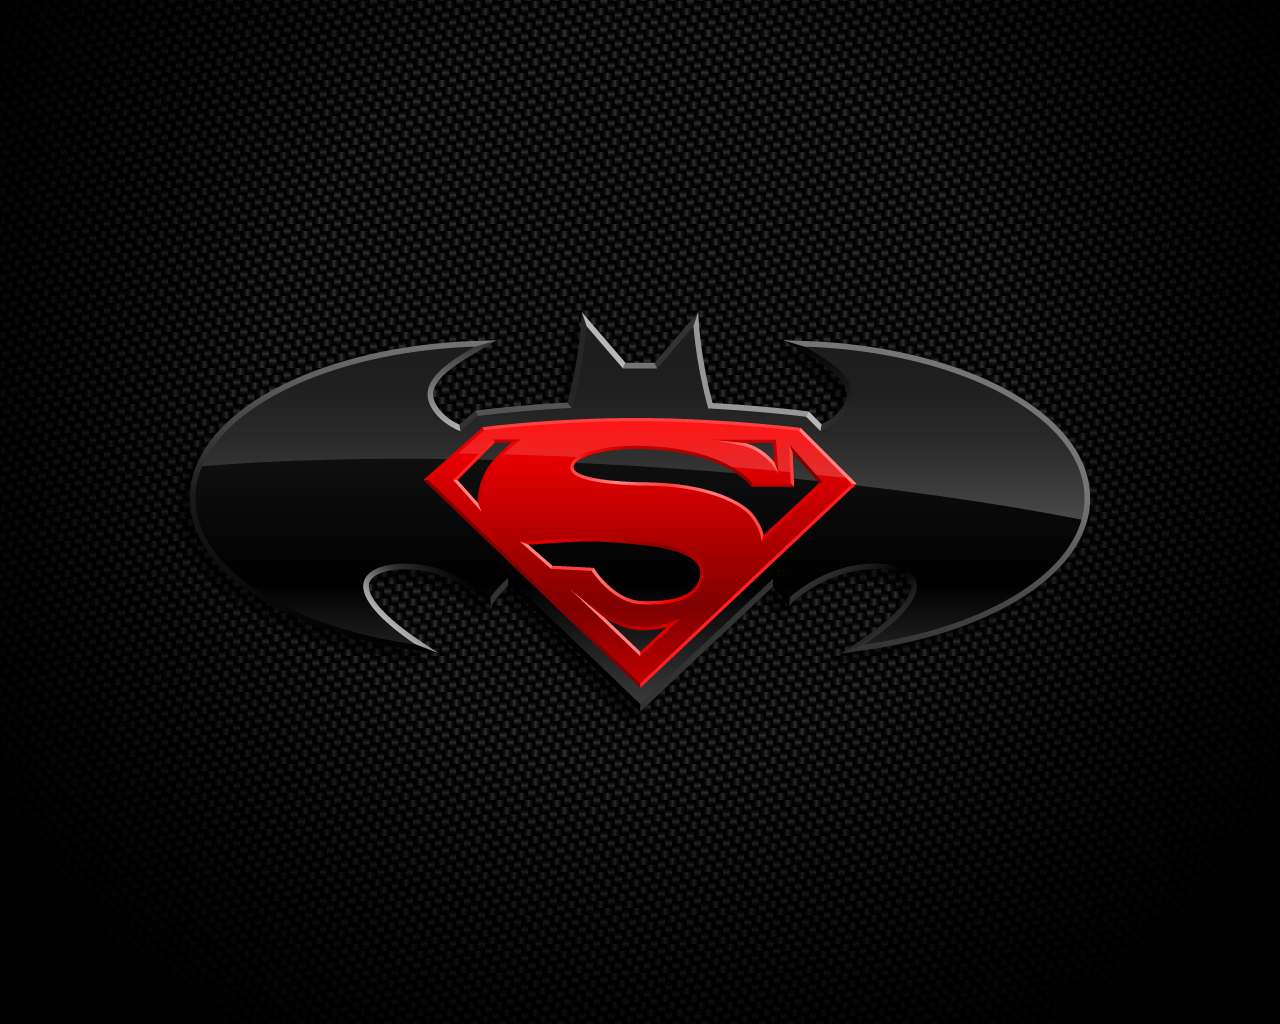 Superman Batman logotipo 4x4